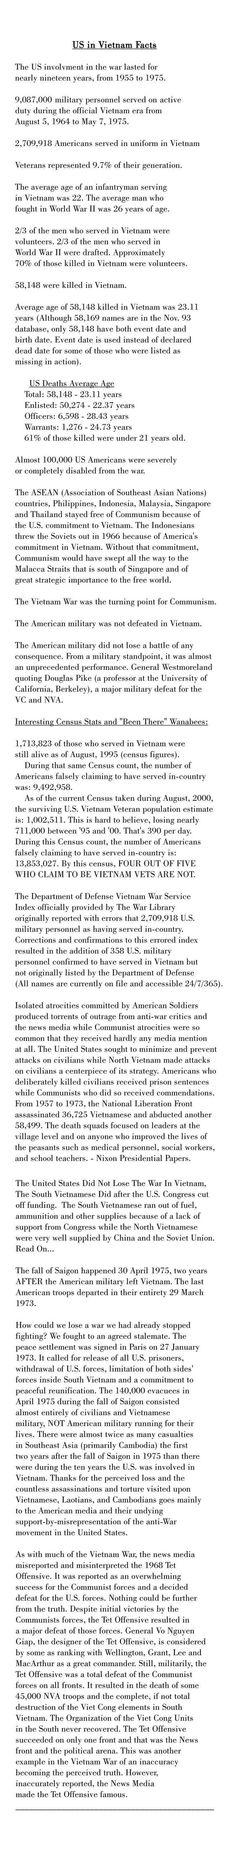 Vietnam War Rip uncle tuan You are still MIA We love you always - vietnam war essay